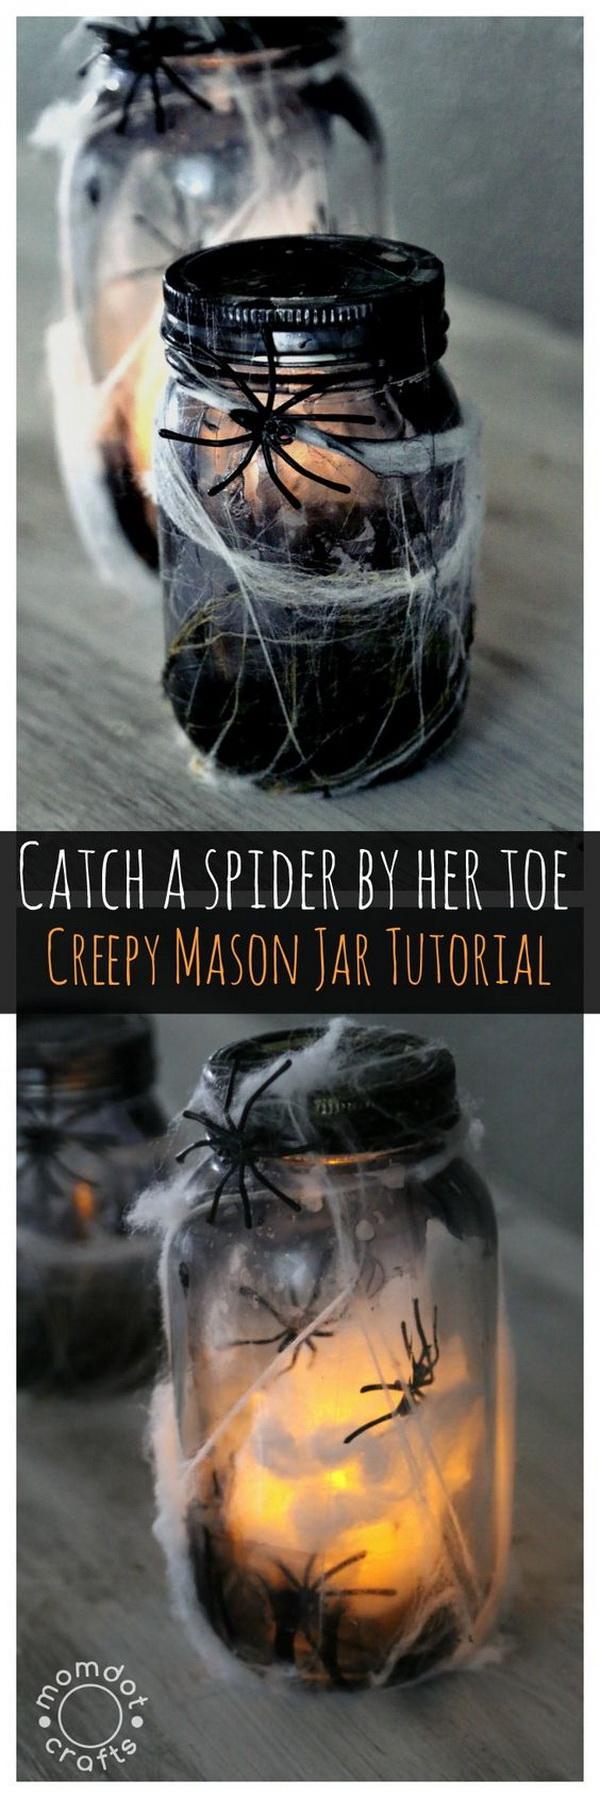 Make A Creepy Light Up Spider Jar For Halloween Decor